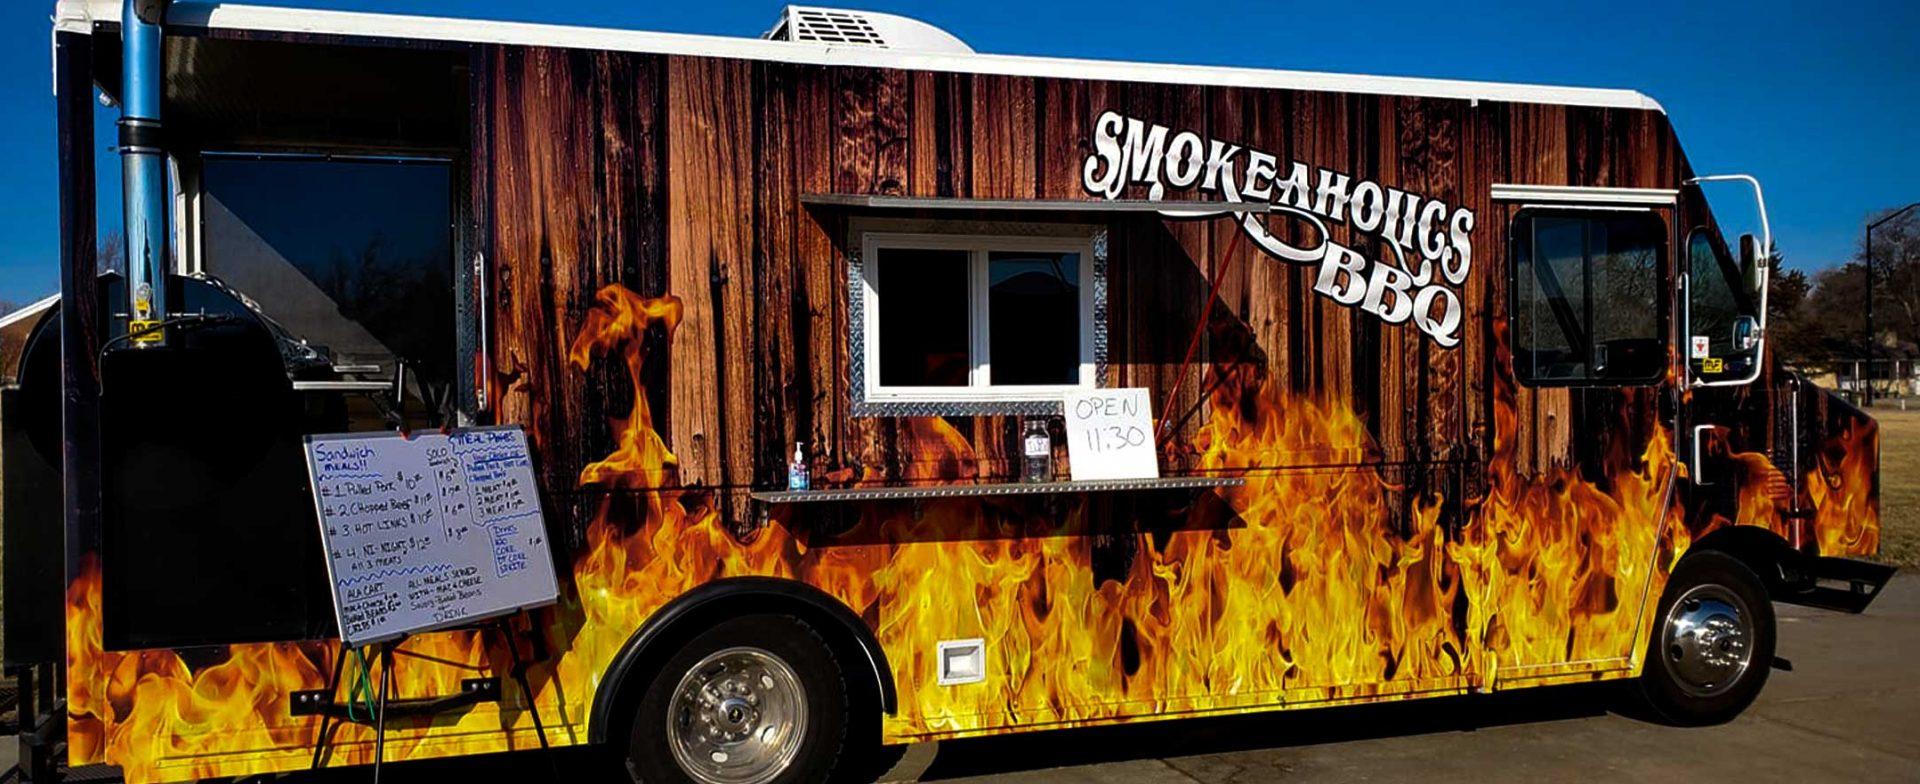 Smokeaholics BBQ Food Truck